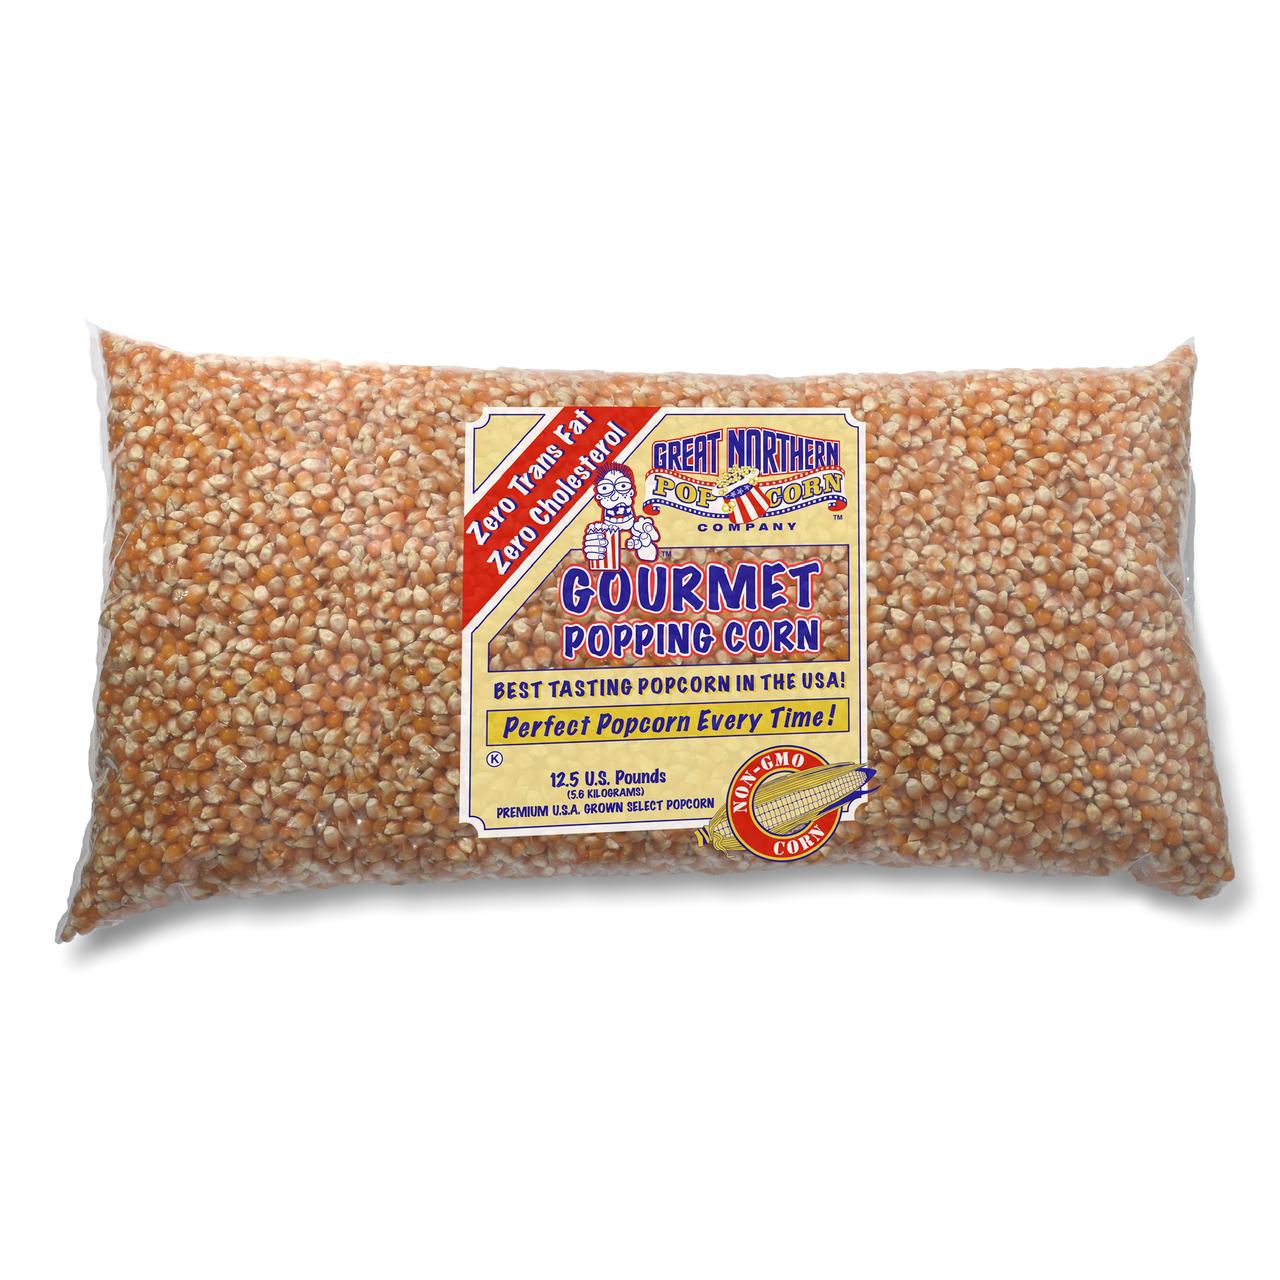 Great Northern Popcorn 83-DT5400 4096 Premium Quality Bulk Original Yellow Gourmet Popcorn - 3-12.5 lbs